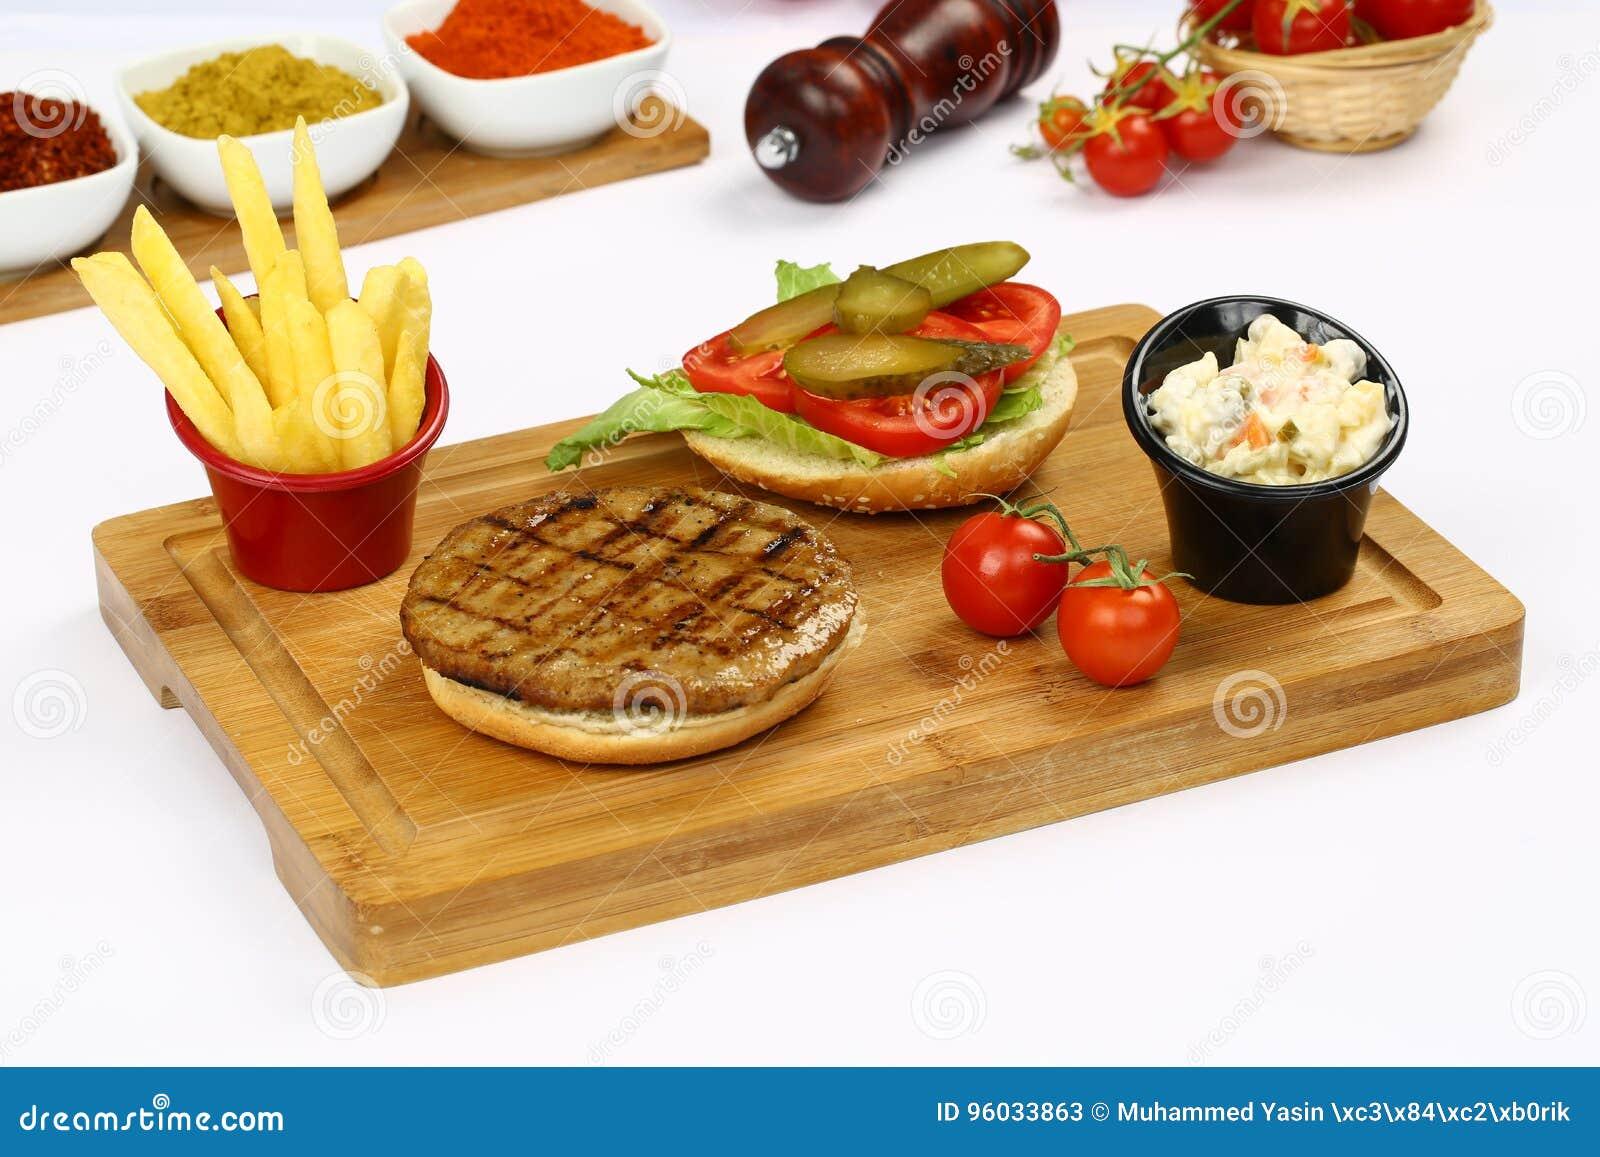 Wołowina hamburger